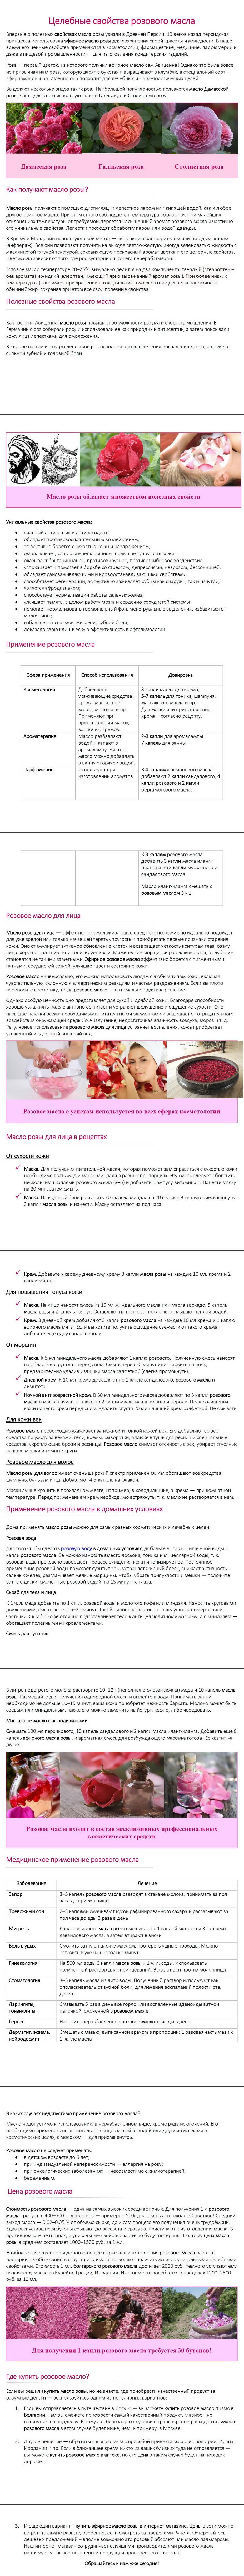 LSI-копирайтинг, LSI-статья